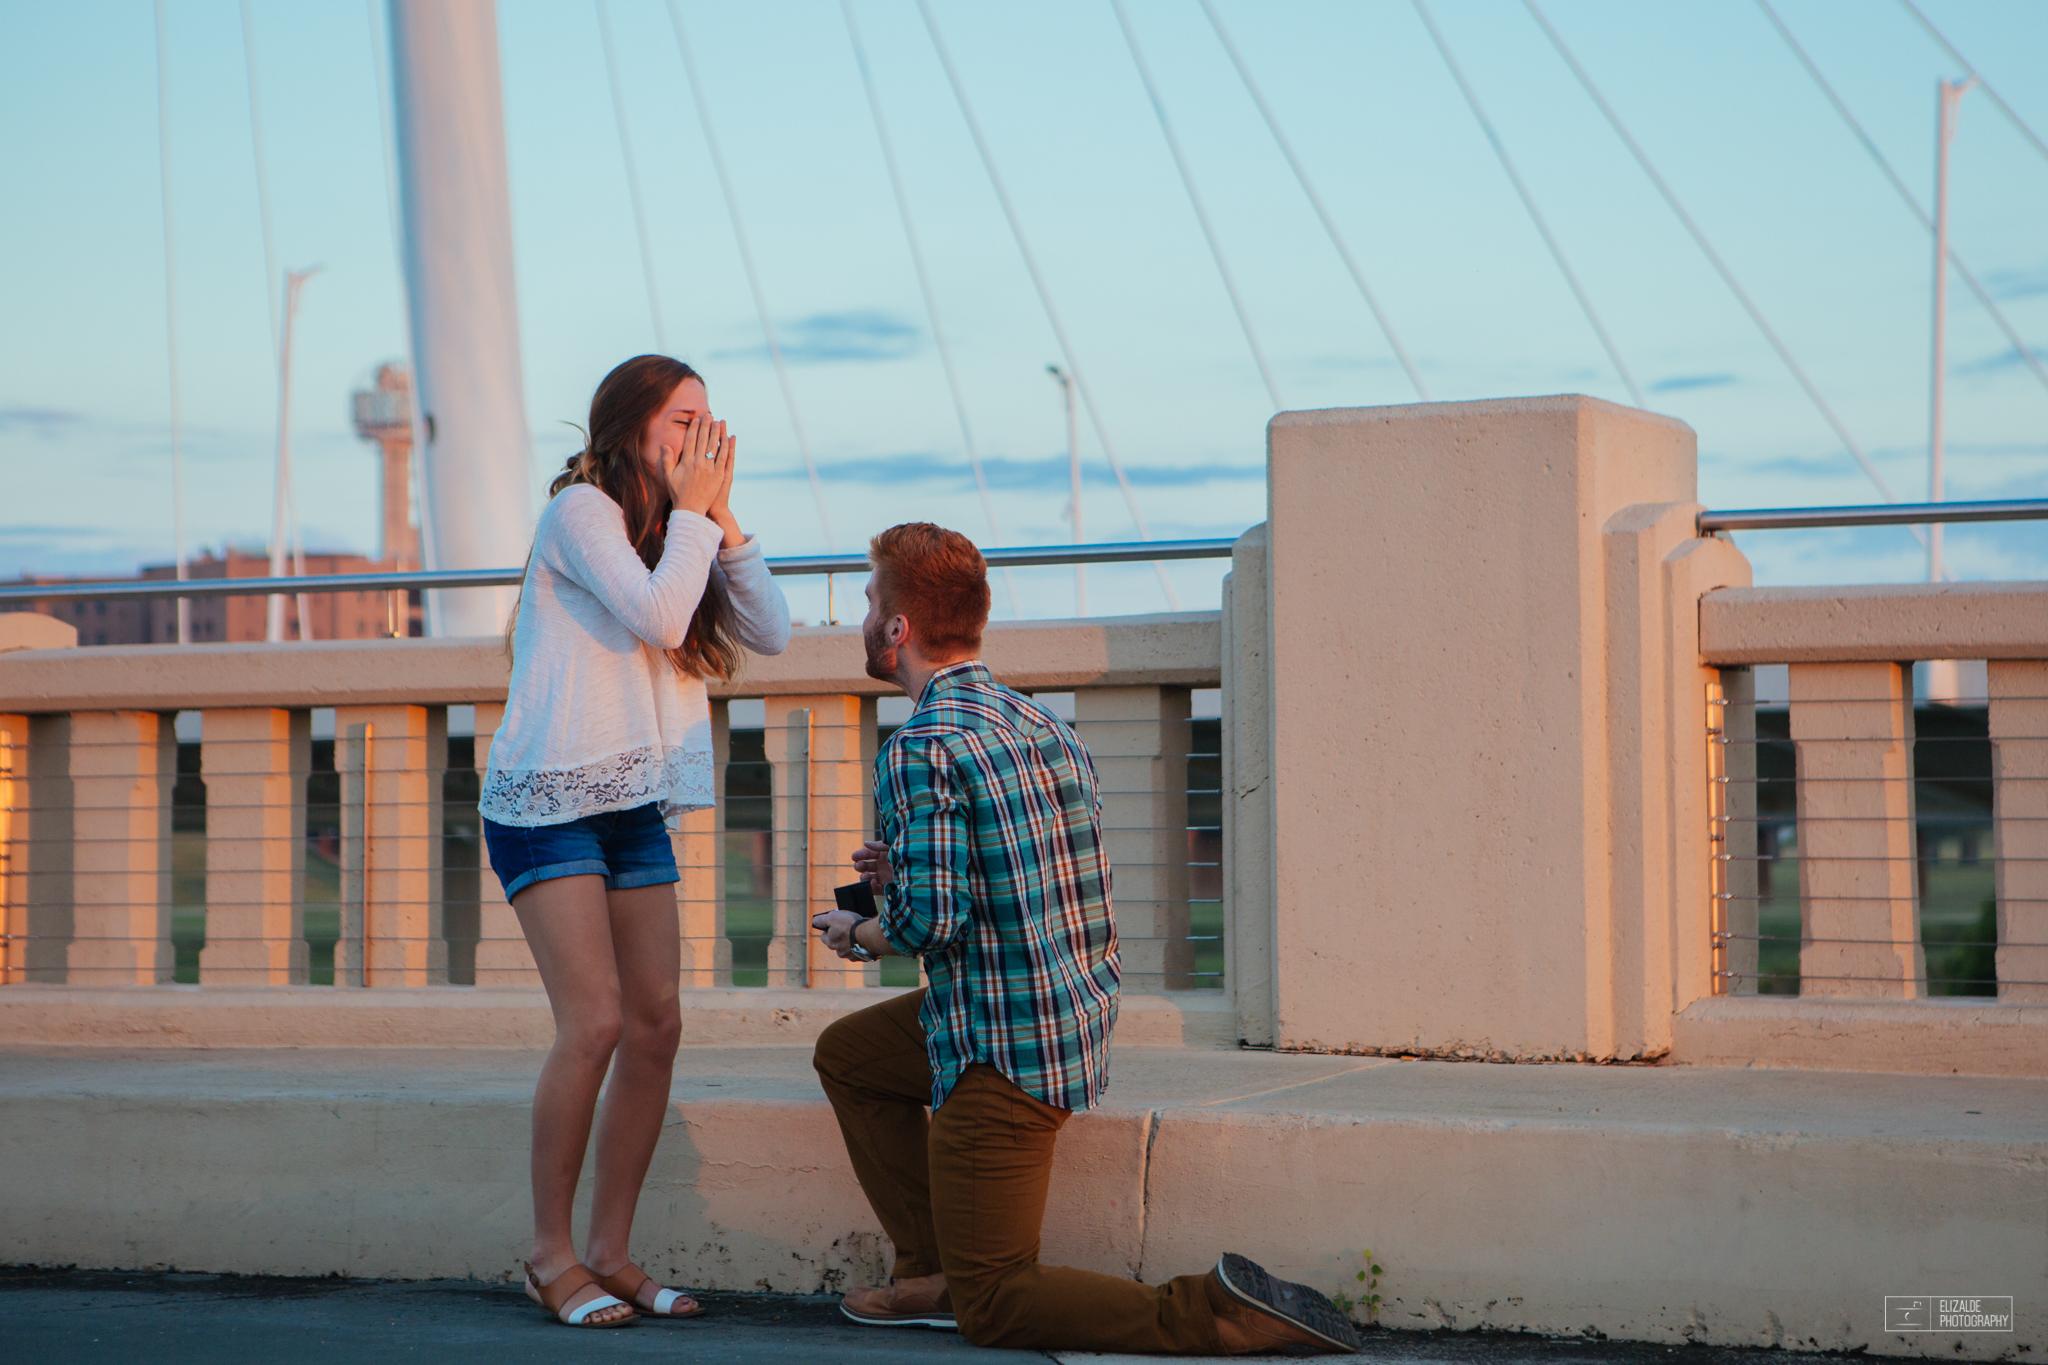 Proposal_DFW Wedding Photographer_Dallas Photographer_Elizalde Photography_margaret hunt hill bridge (6 of 21).jpg